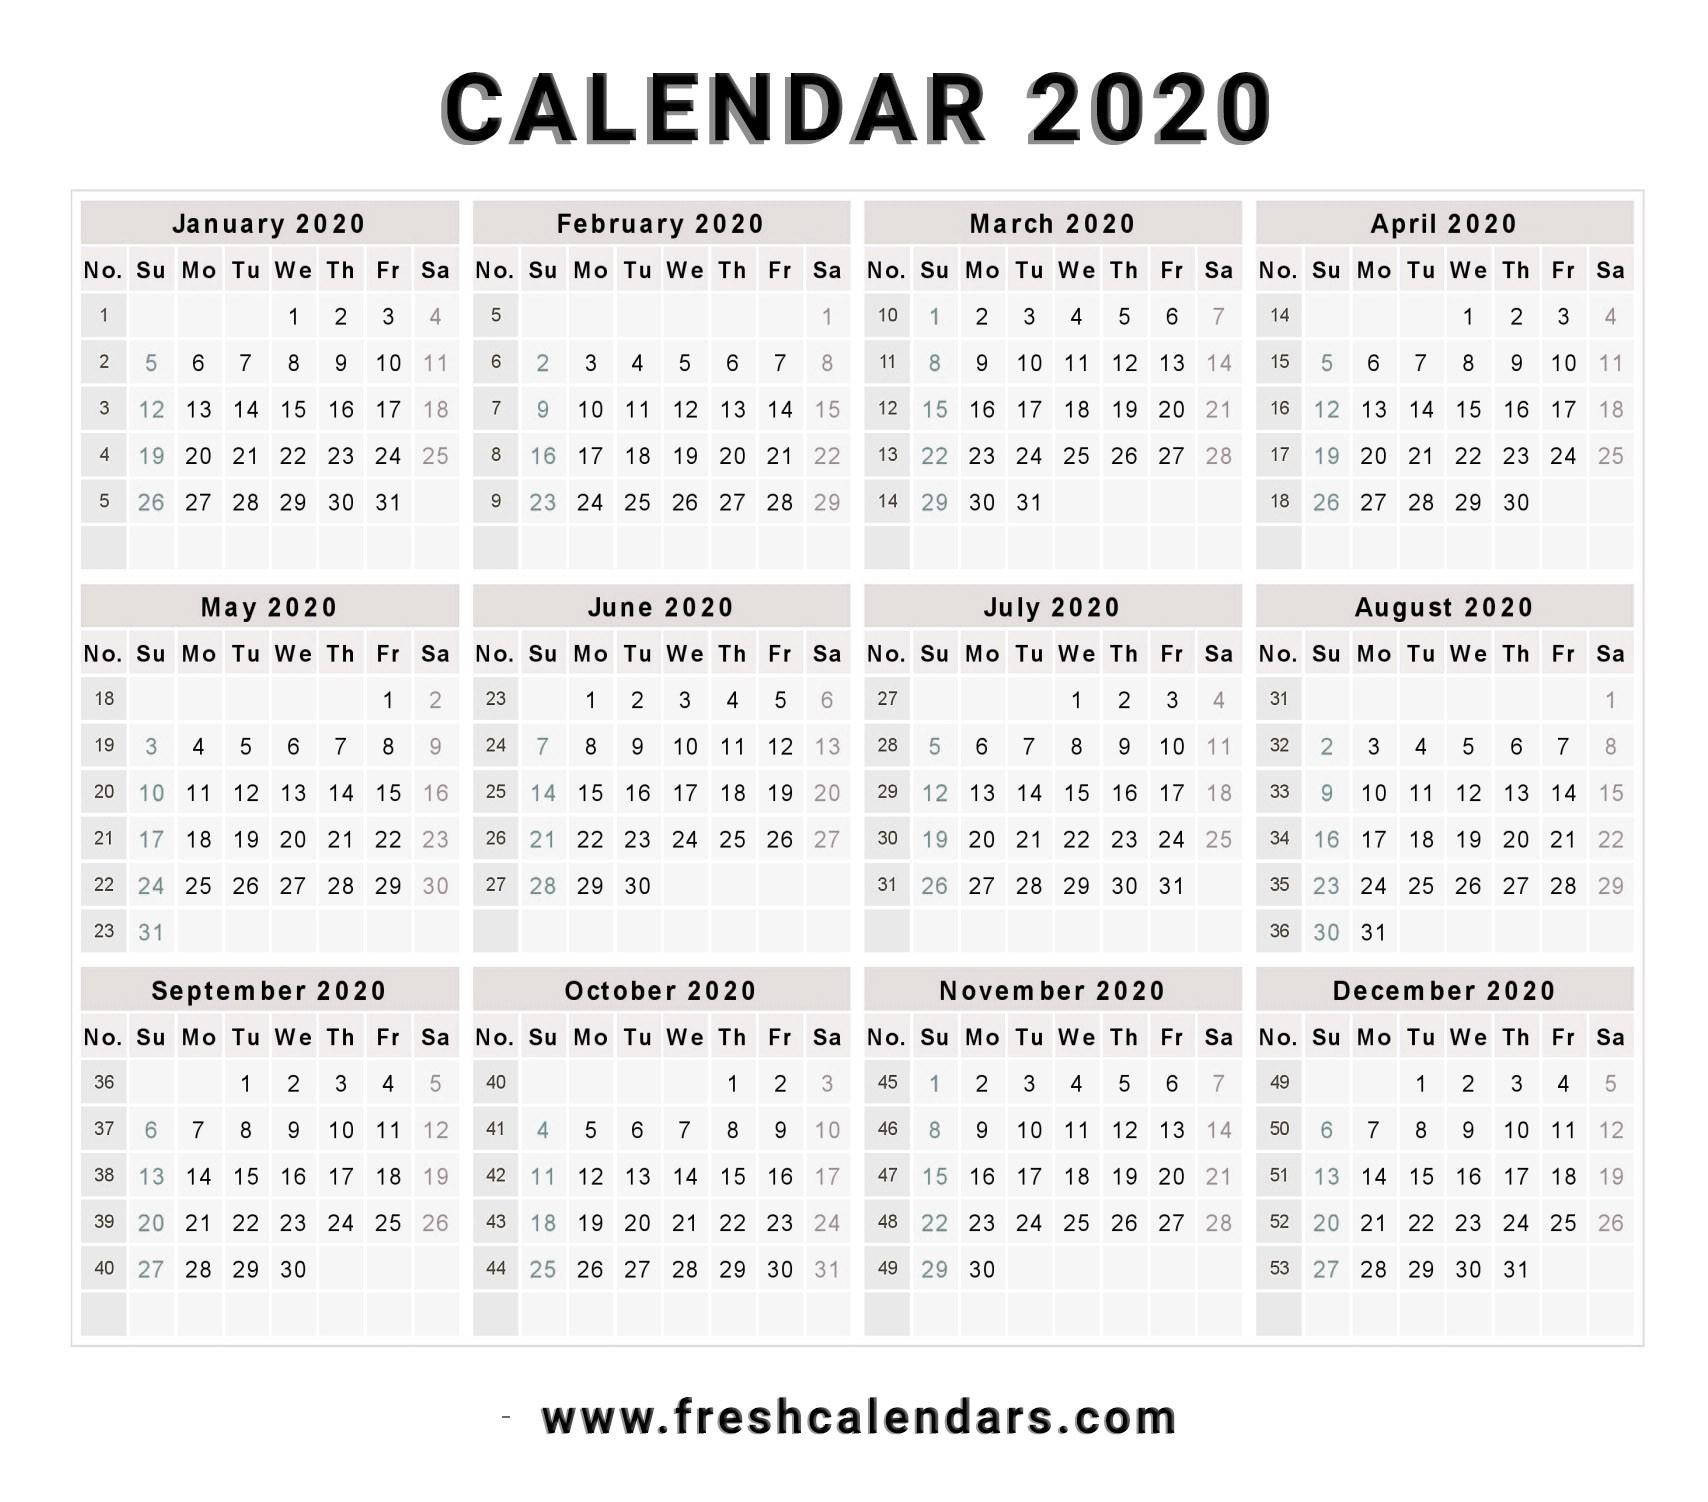 Free Printable 2020 Calendar With Holidays 16 - Crearphpnuke for 2020 Vertex Calendars Printable Free